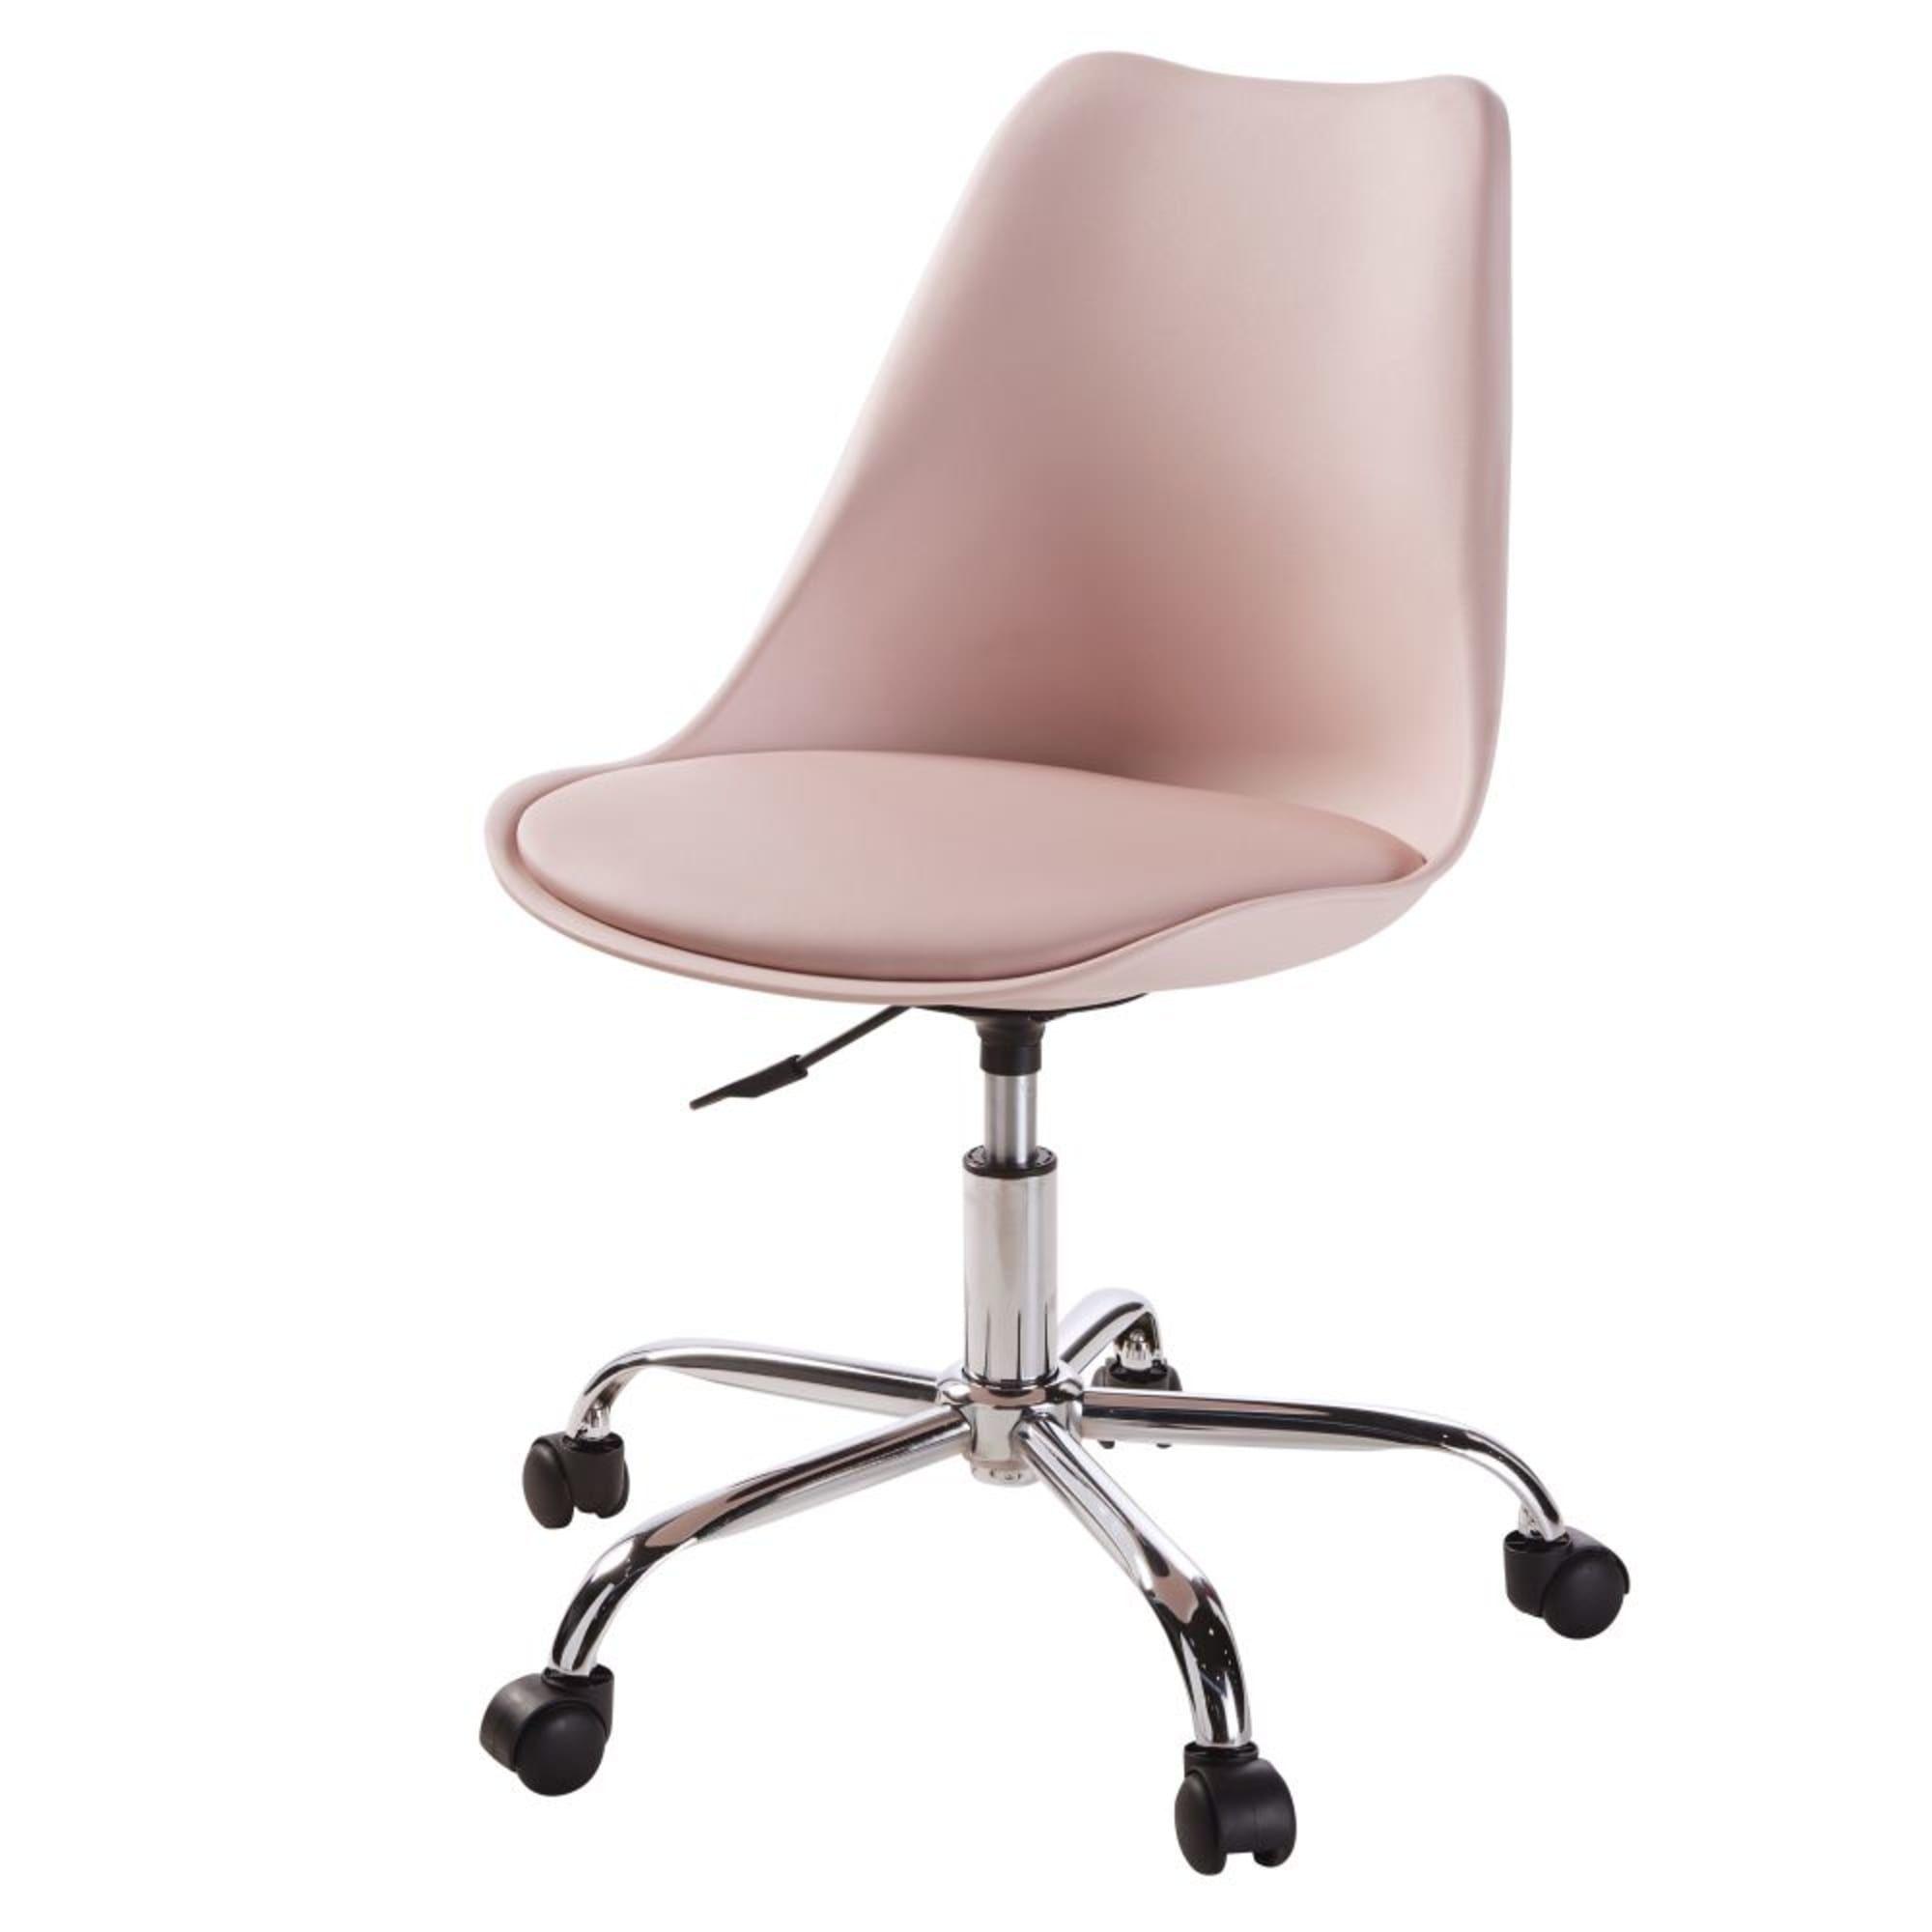 Silla De Escritorio Con Ruedas Rosa Bristol Maisons Du Monde Chaise Bureau Chaise De Bureau Vintage Bureau Fille